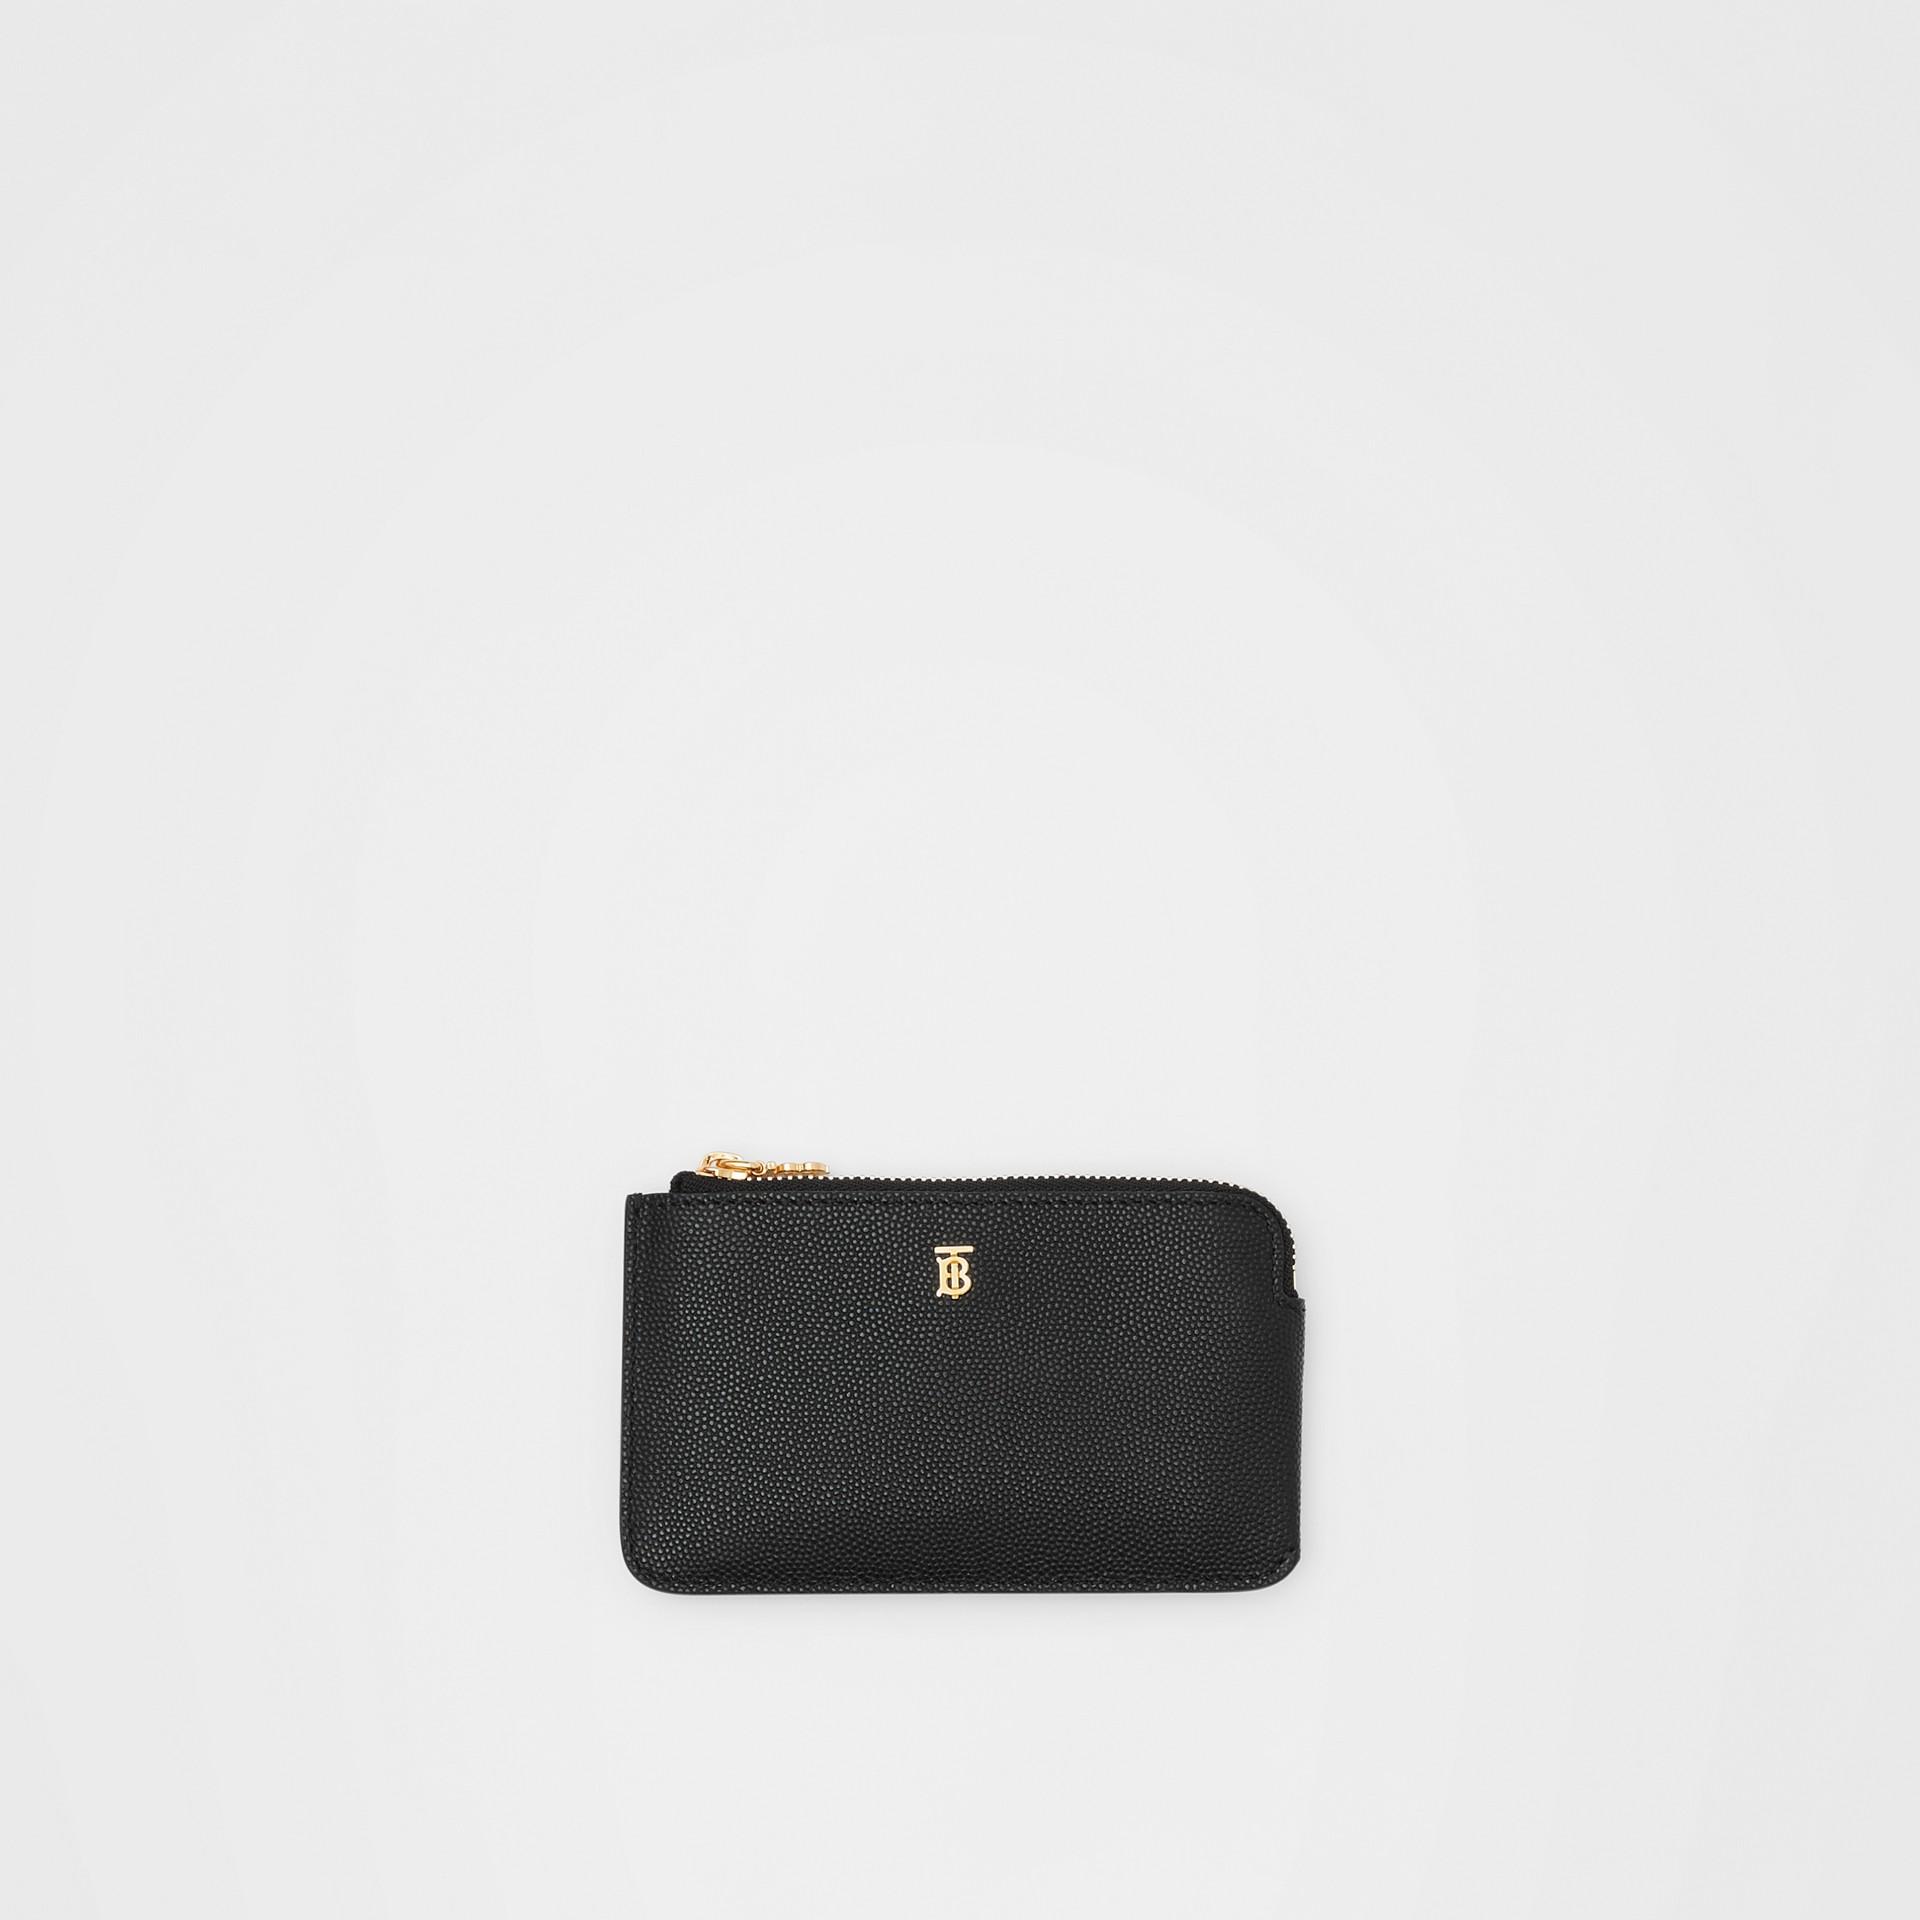 Monogram Motif Grainy Leather Zip Coin Case in Black - Women | Burberry - gallery image 0